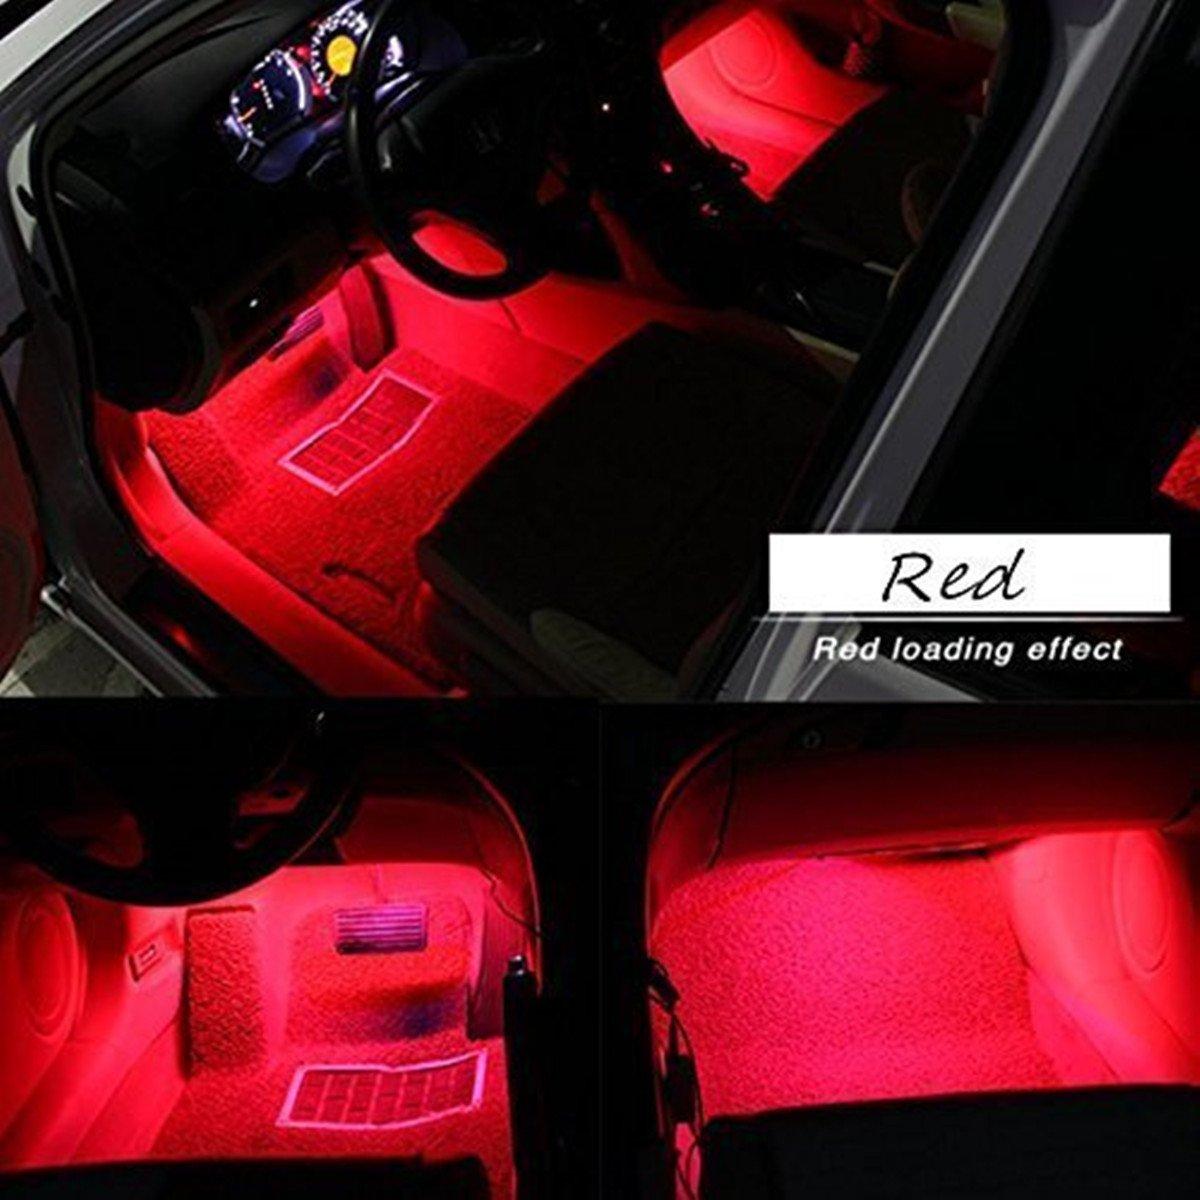 Car LED Strip Light, EJ's SUPER CAR 4pcs 36 LED Multi-color Car Interior Lights Under Dash Lighting Waterproof Kit with Multi-Mode Change and Wireless Remote Control, Car Charger Included,DC 12V EJ' s SUPER CAR